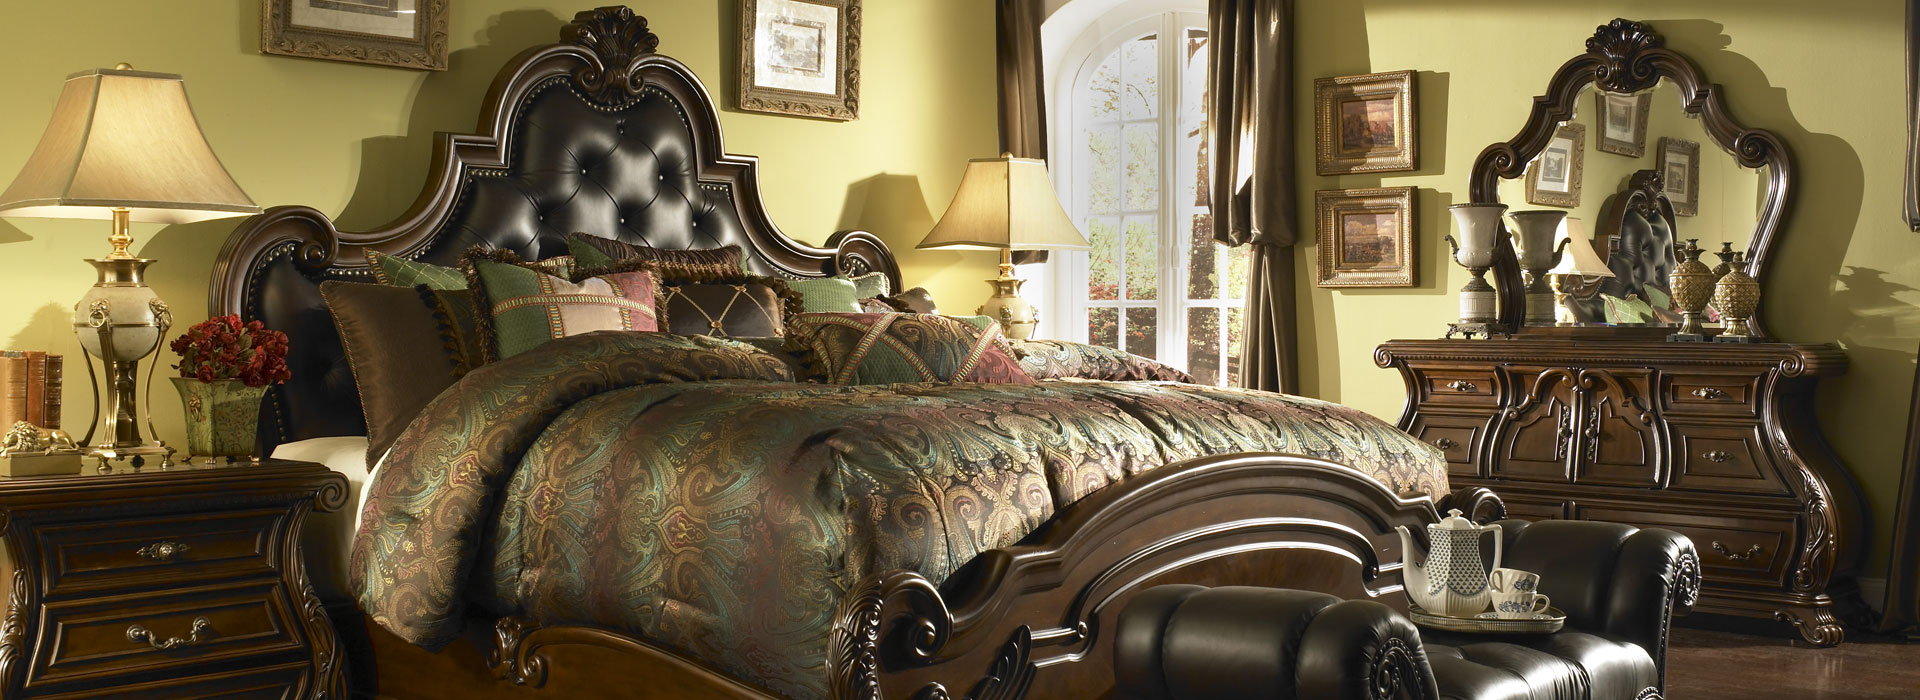 Fantastic Michael Amini Furniture Designs | amini.com WH75